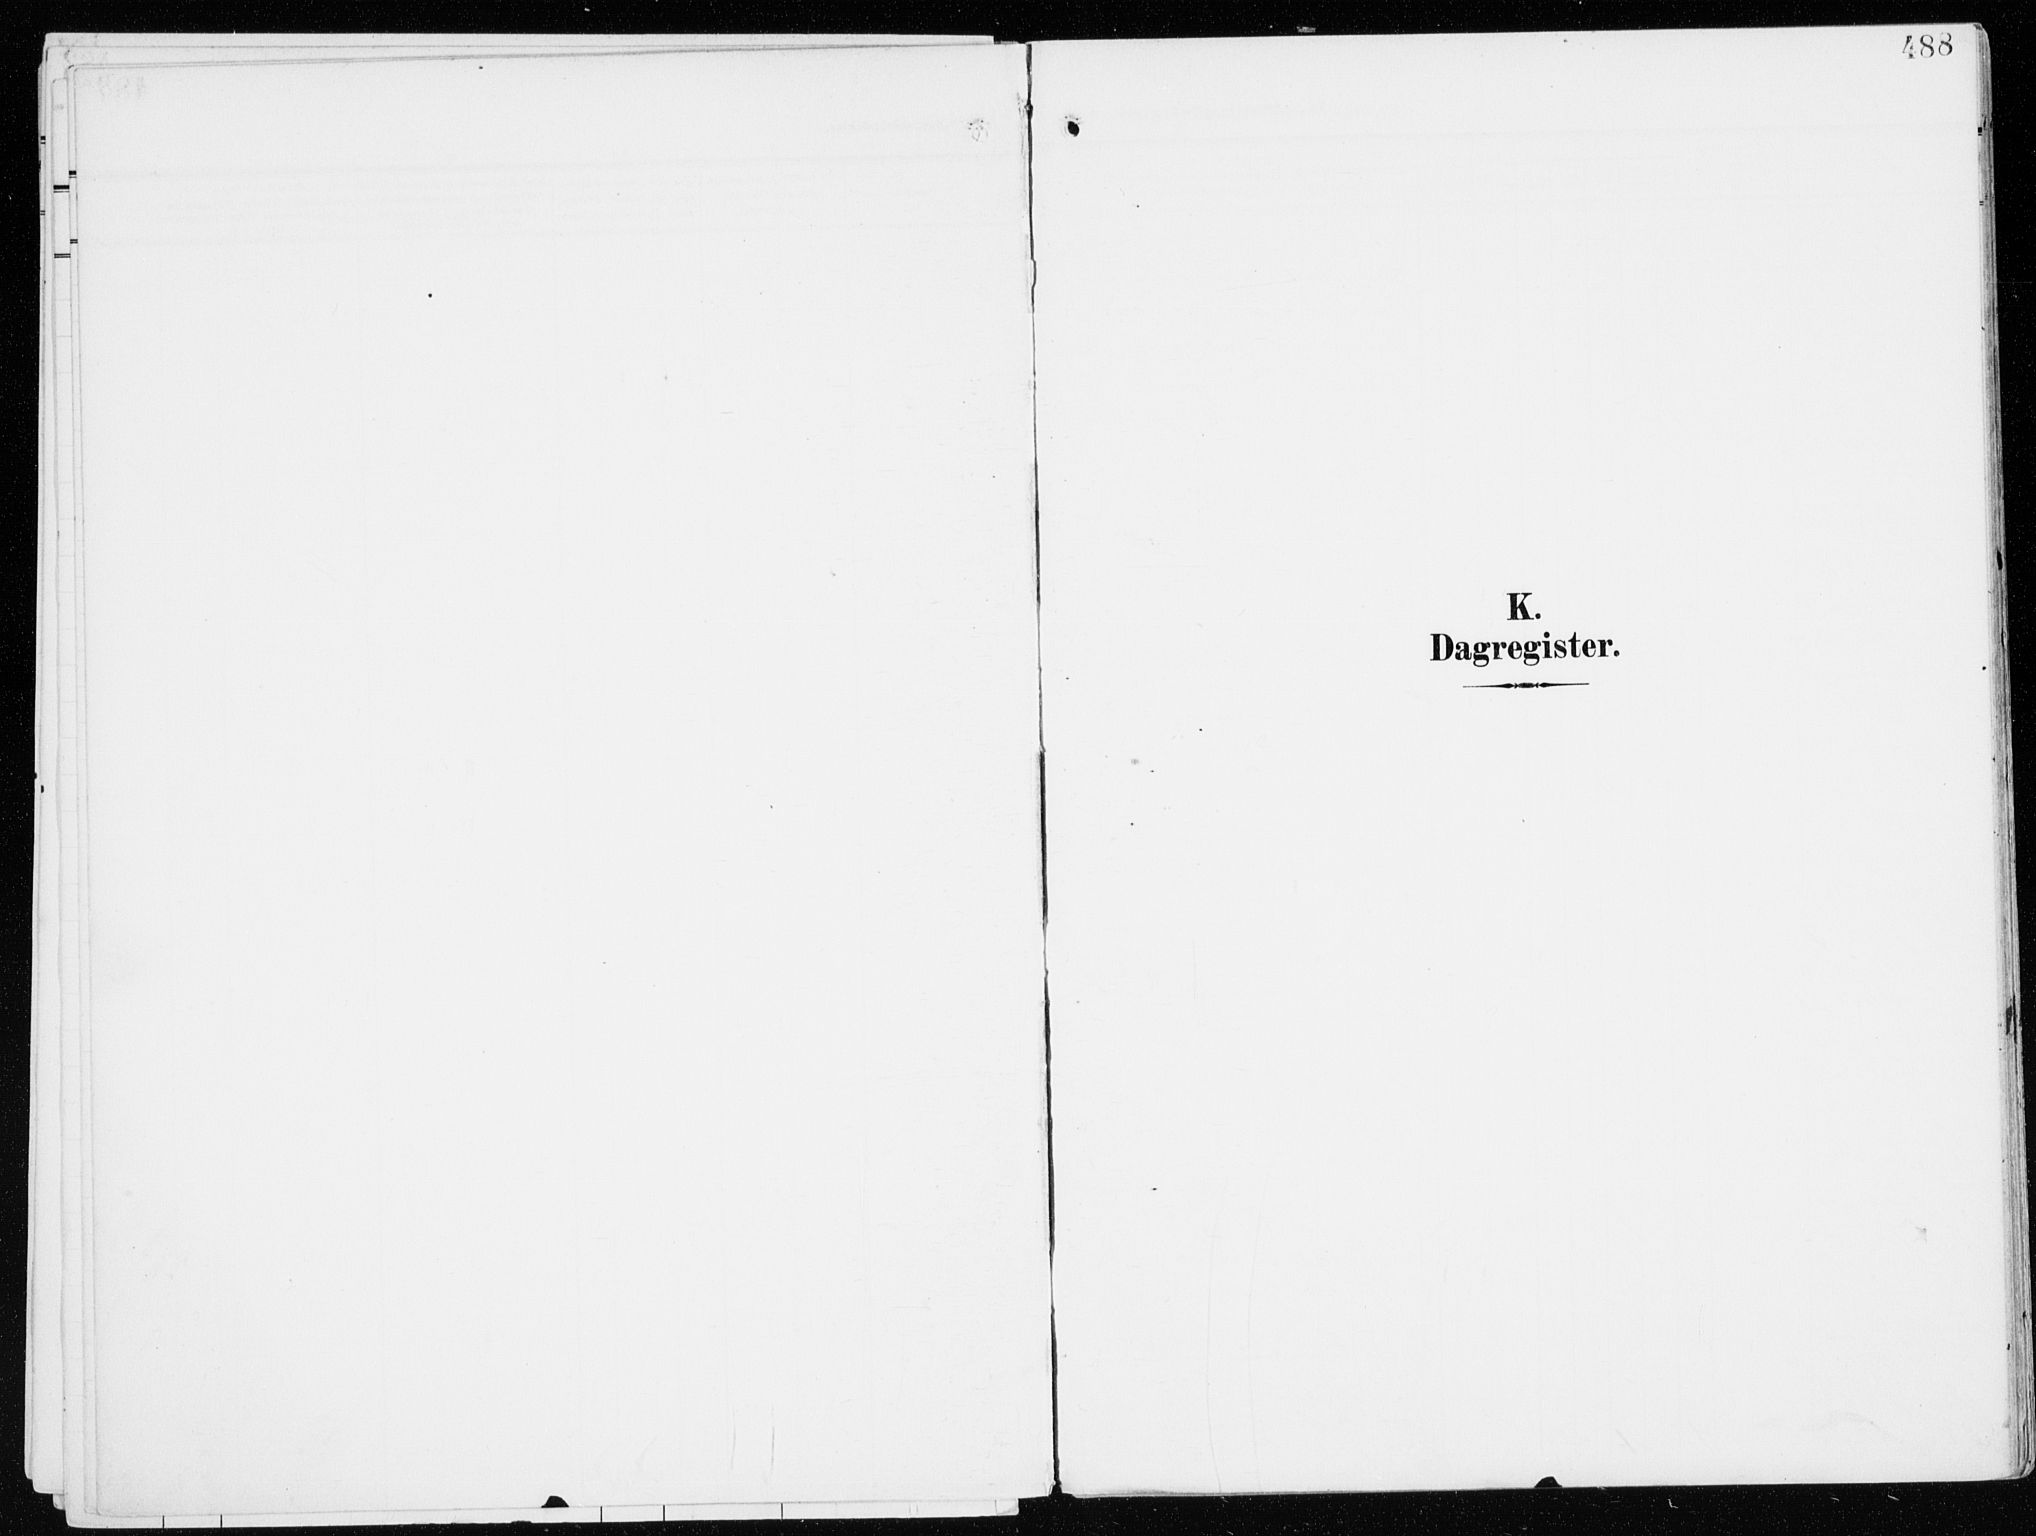 SAH, Furnes prestekontor, K/Ka/L0001: Ministerialbok nr. 1, 1907-1935, s. 488